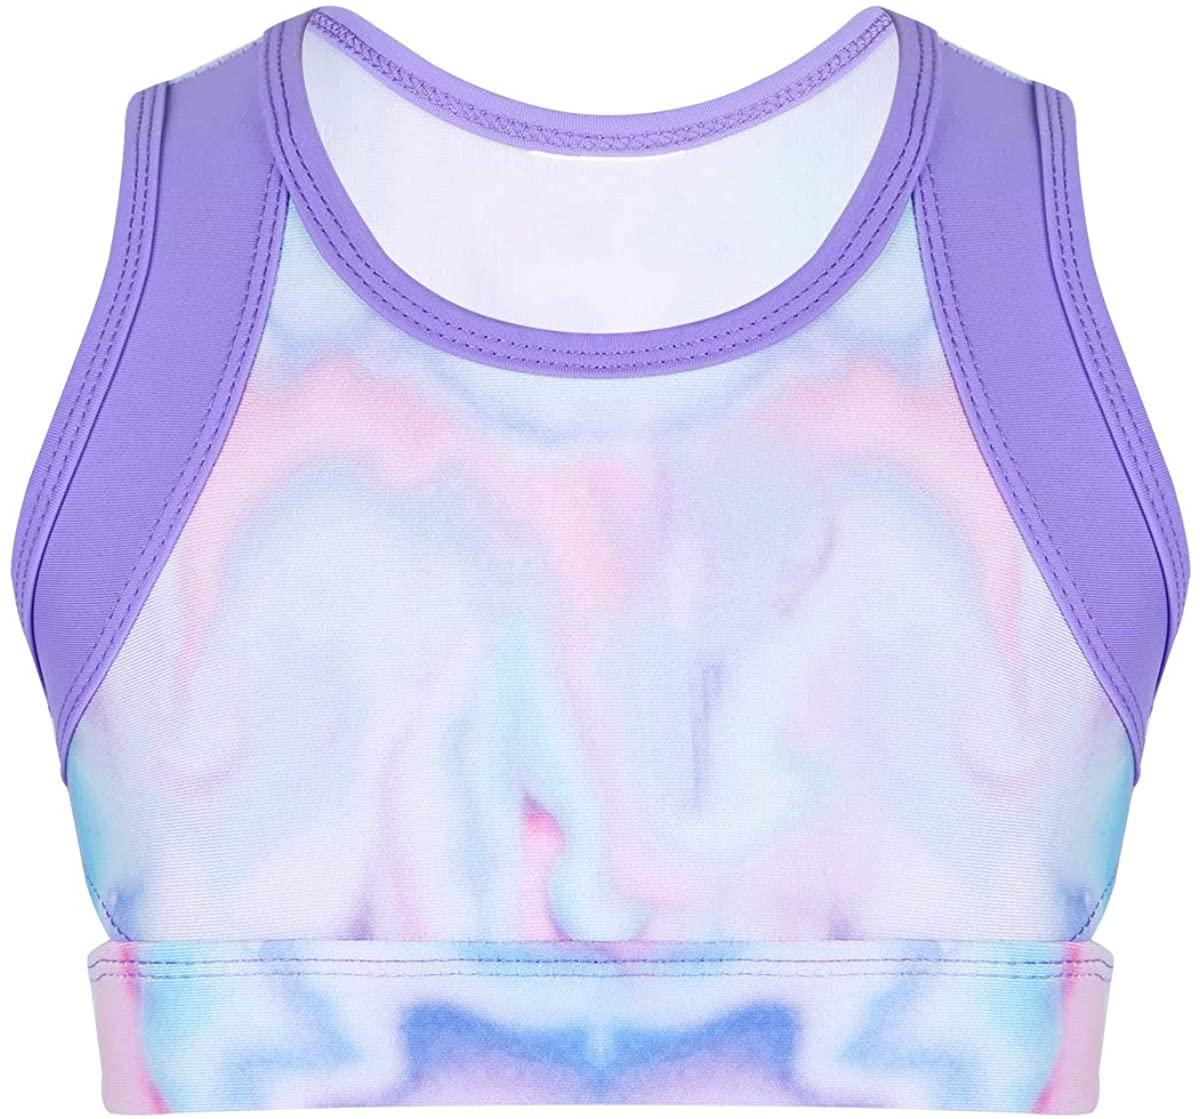 zdhoor Kids Girls Sports Bra Ballet Dance Workout Yoga Training Colorful Tanks Crop Top Gymnastics Sportswear